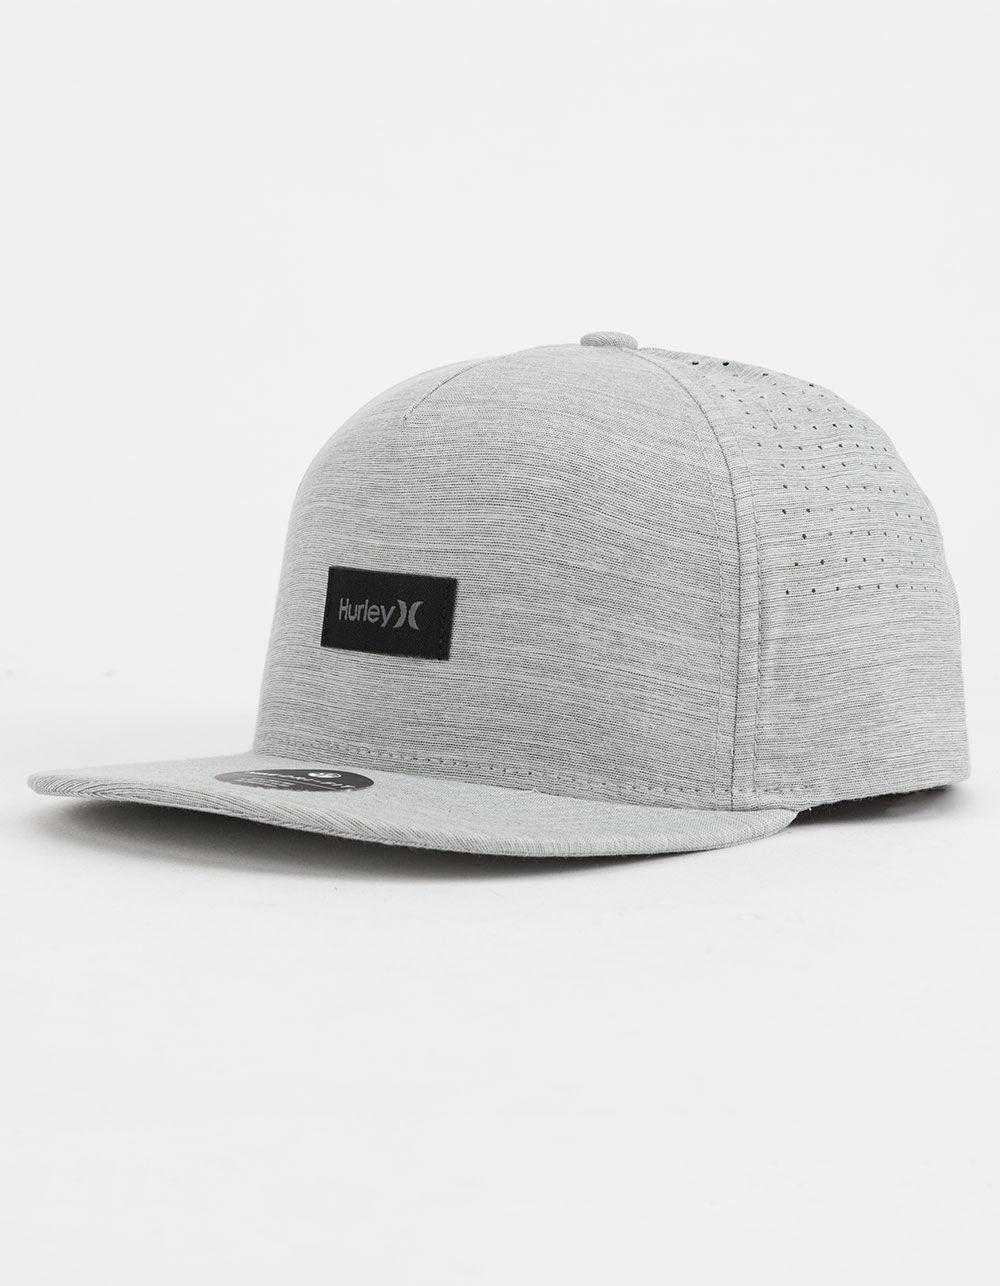 5b7b3f6eaa80c Hurley Dri-fit Staple Gray Mens Snapback Hat in Gray for Men - Lyst